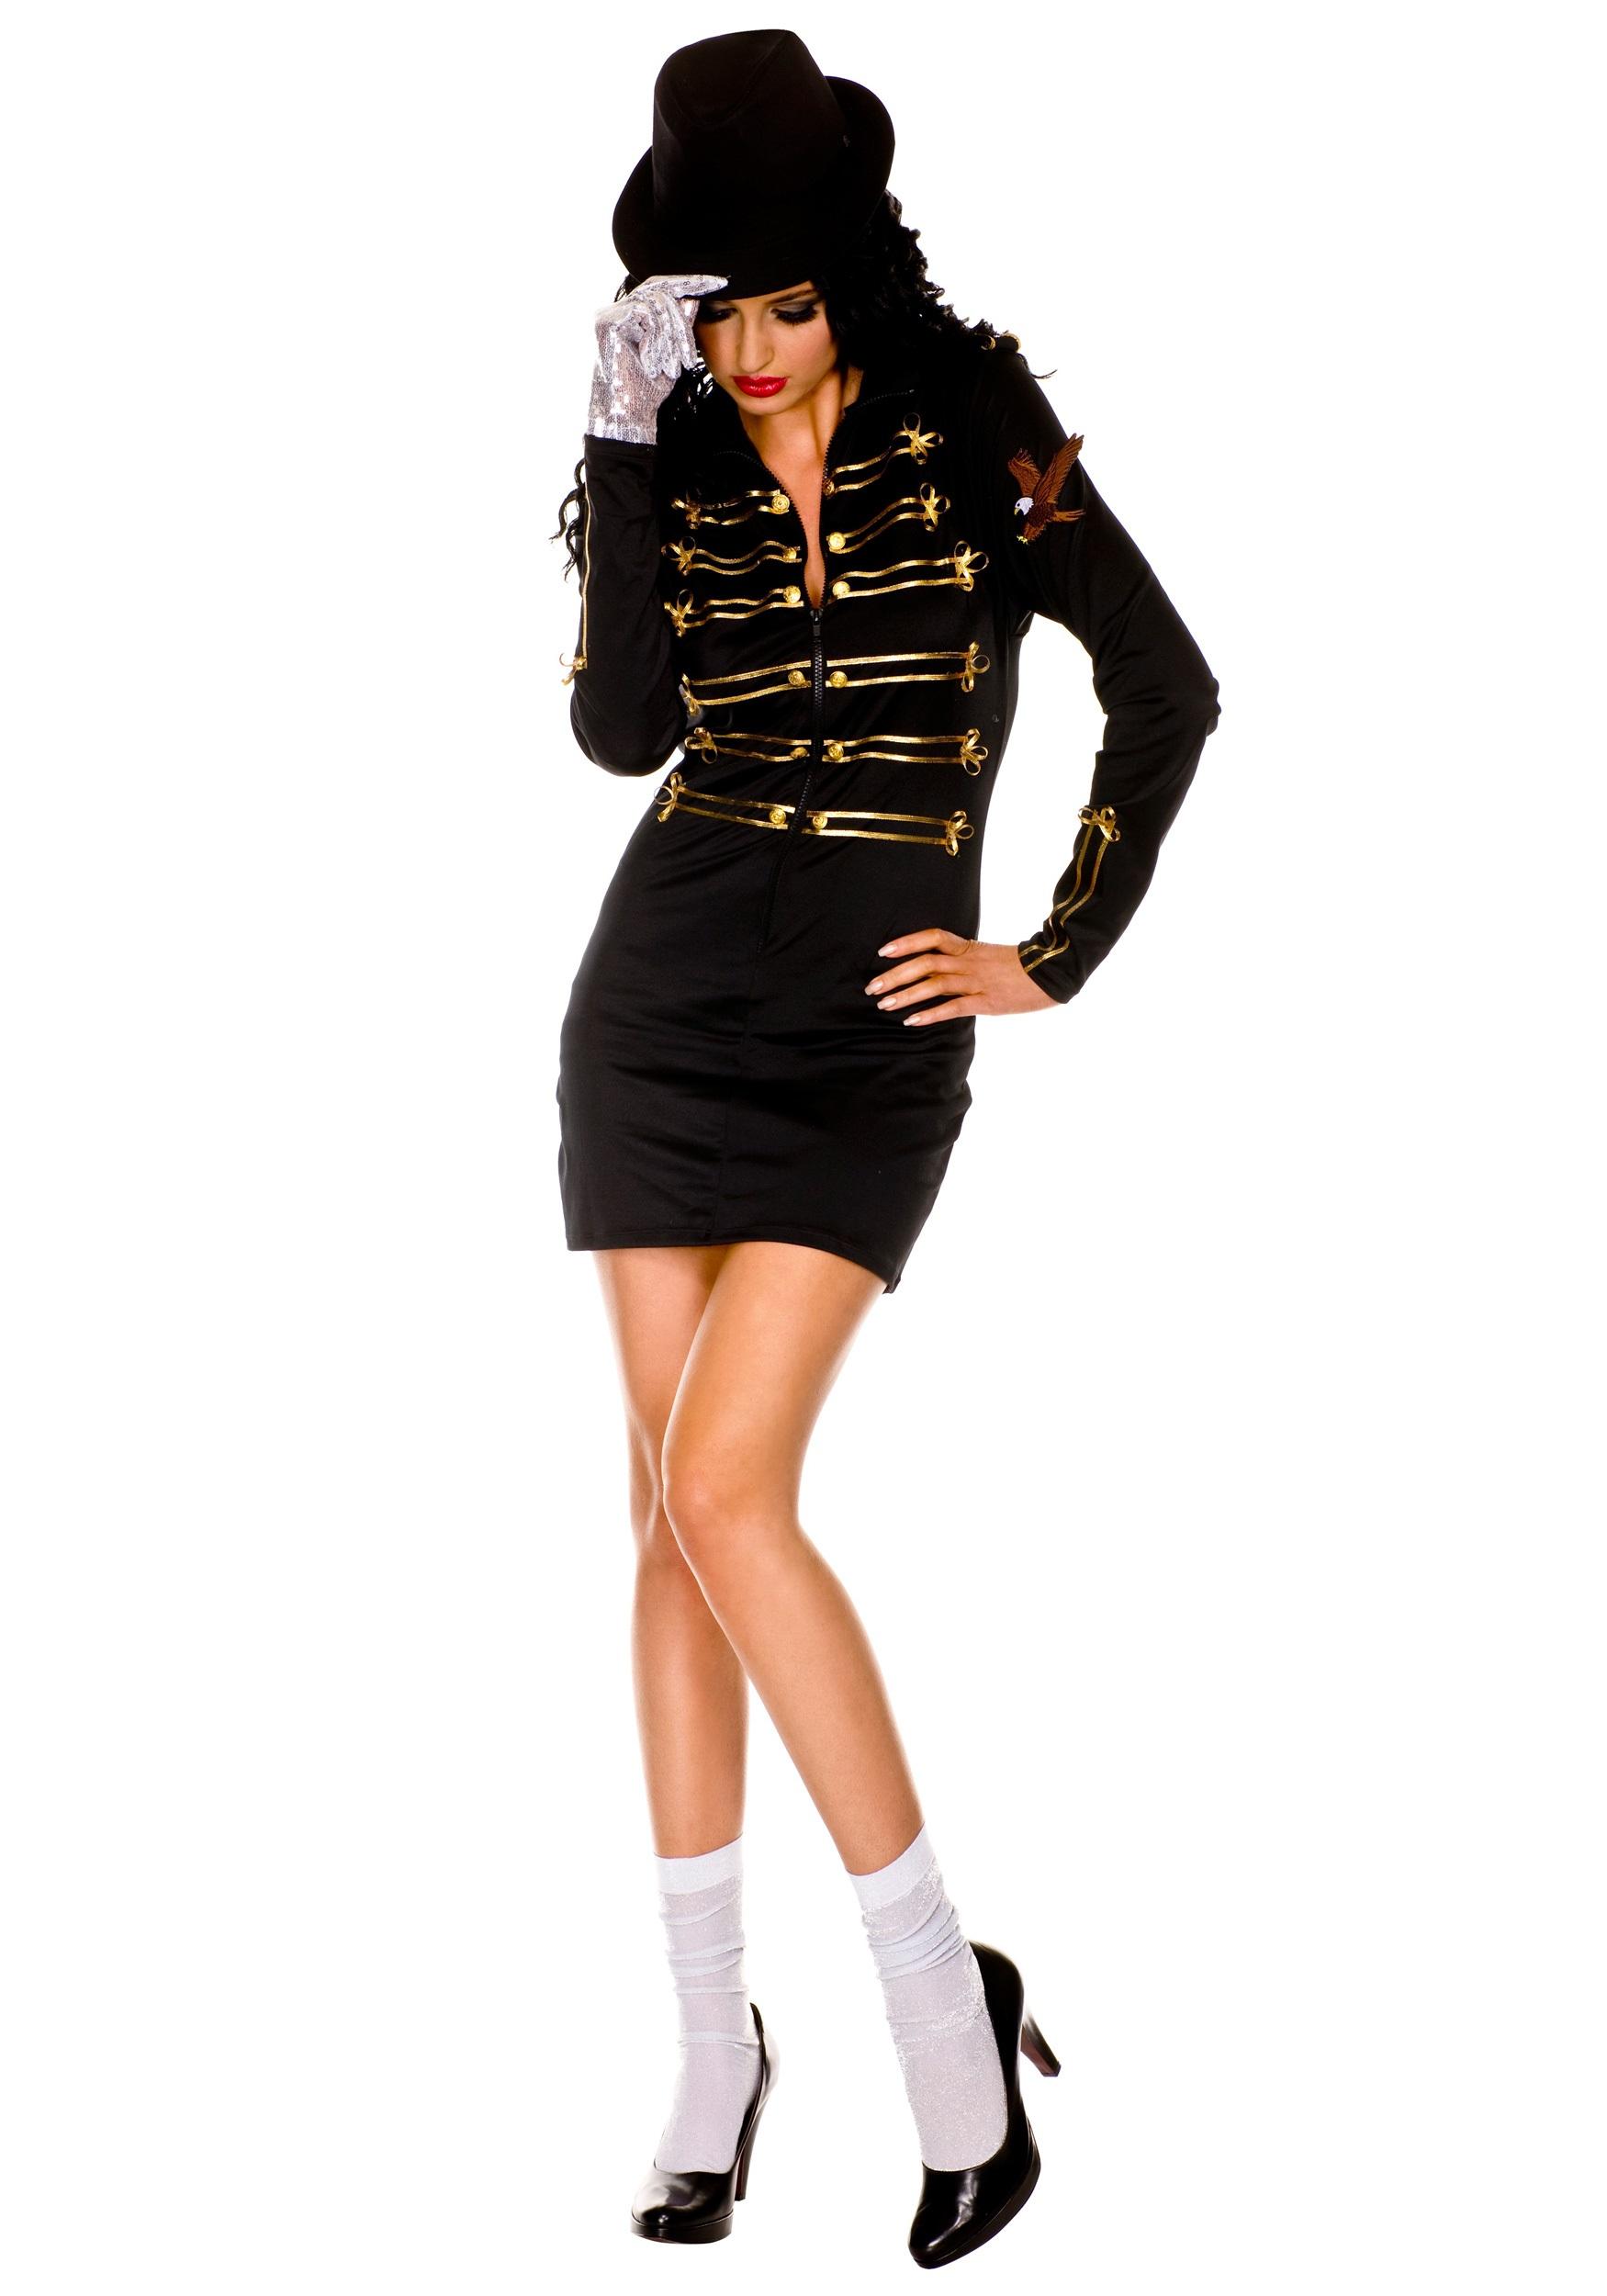 Sexy One Glove Pop Diva Costume  sc 1 st  Halloween Costume & Sexy One Glove Pop Diva Costume - 80s Superstar Costume Ideas